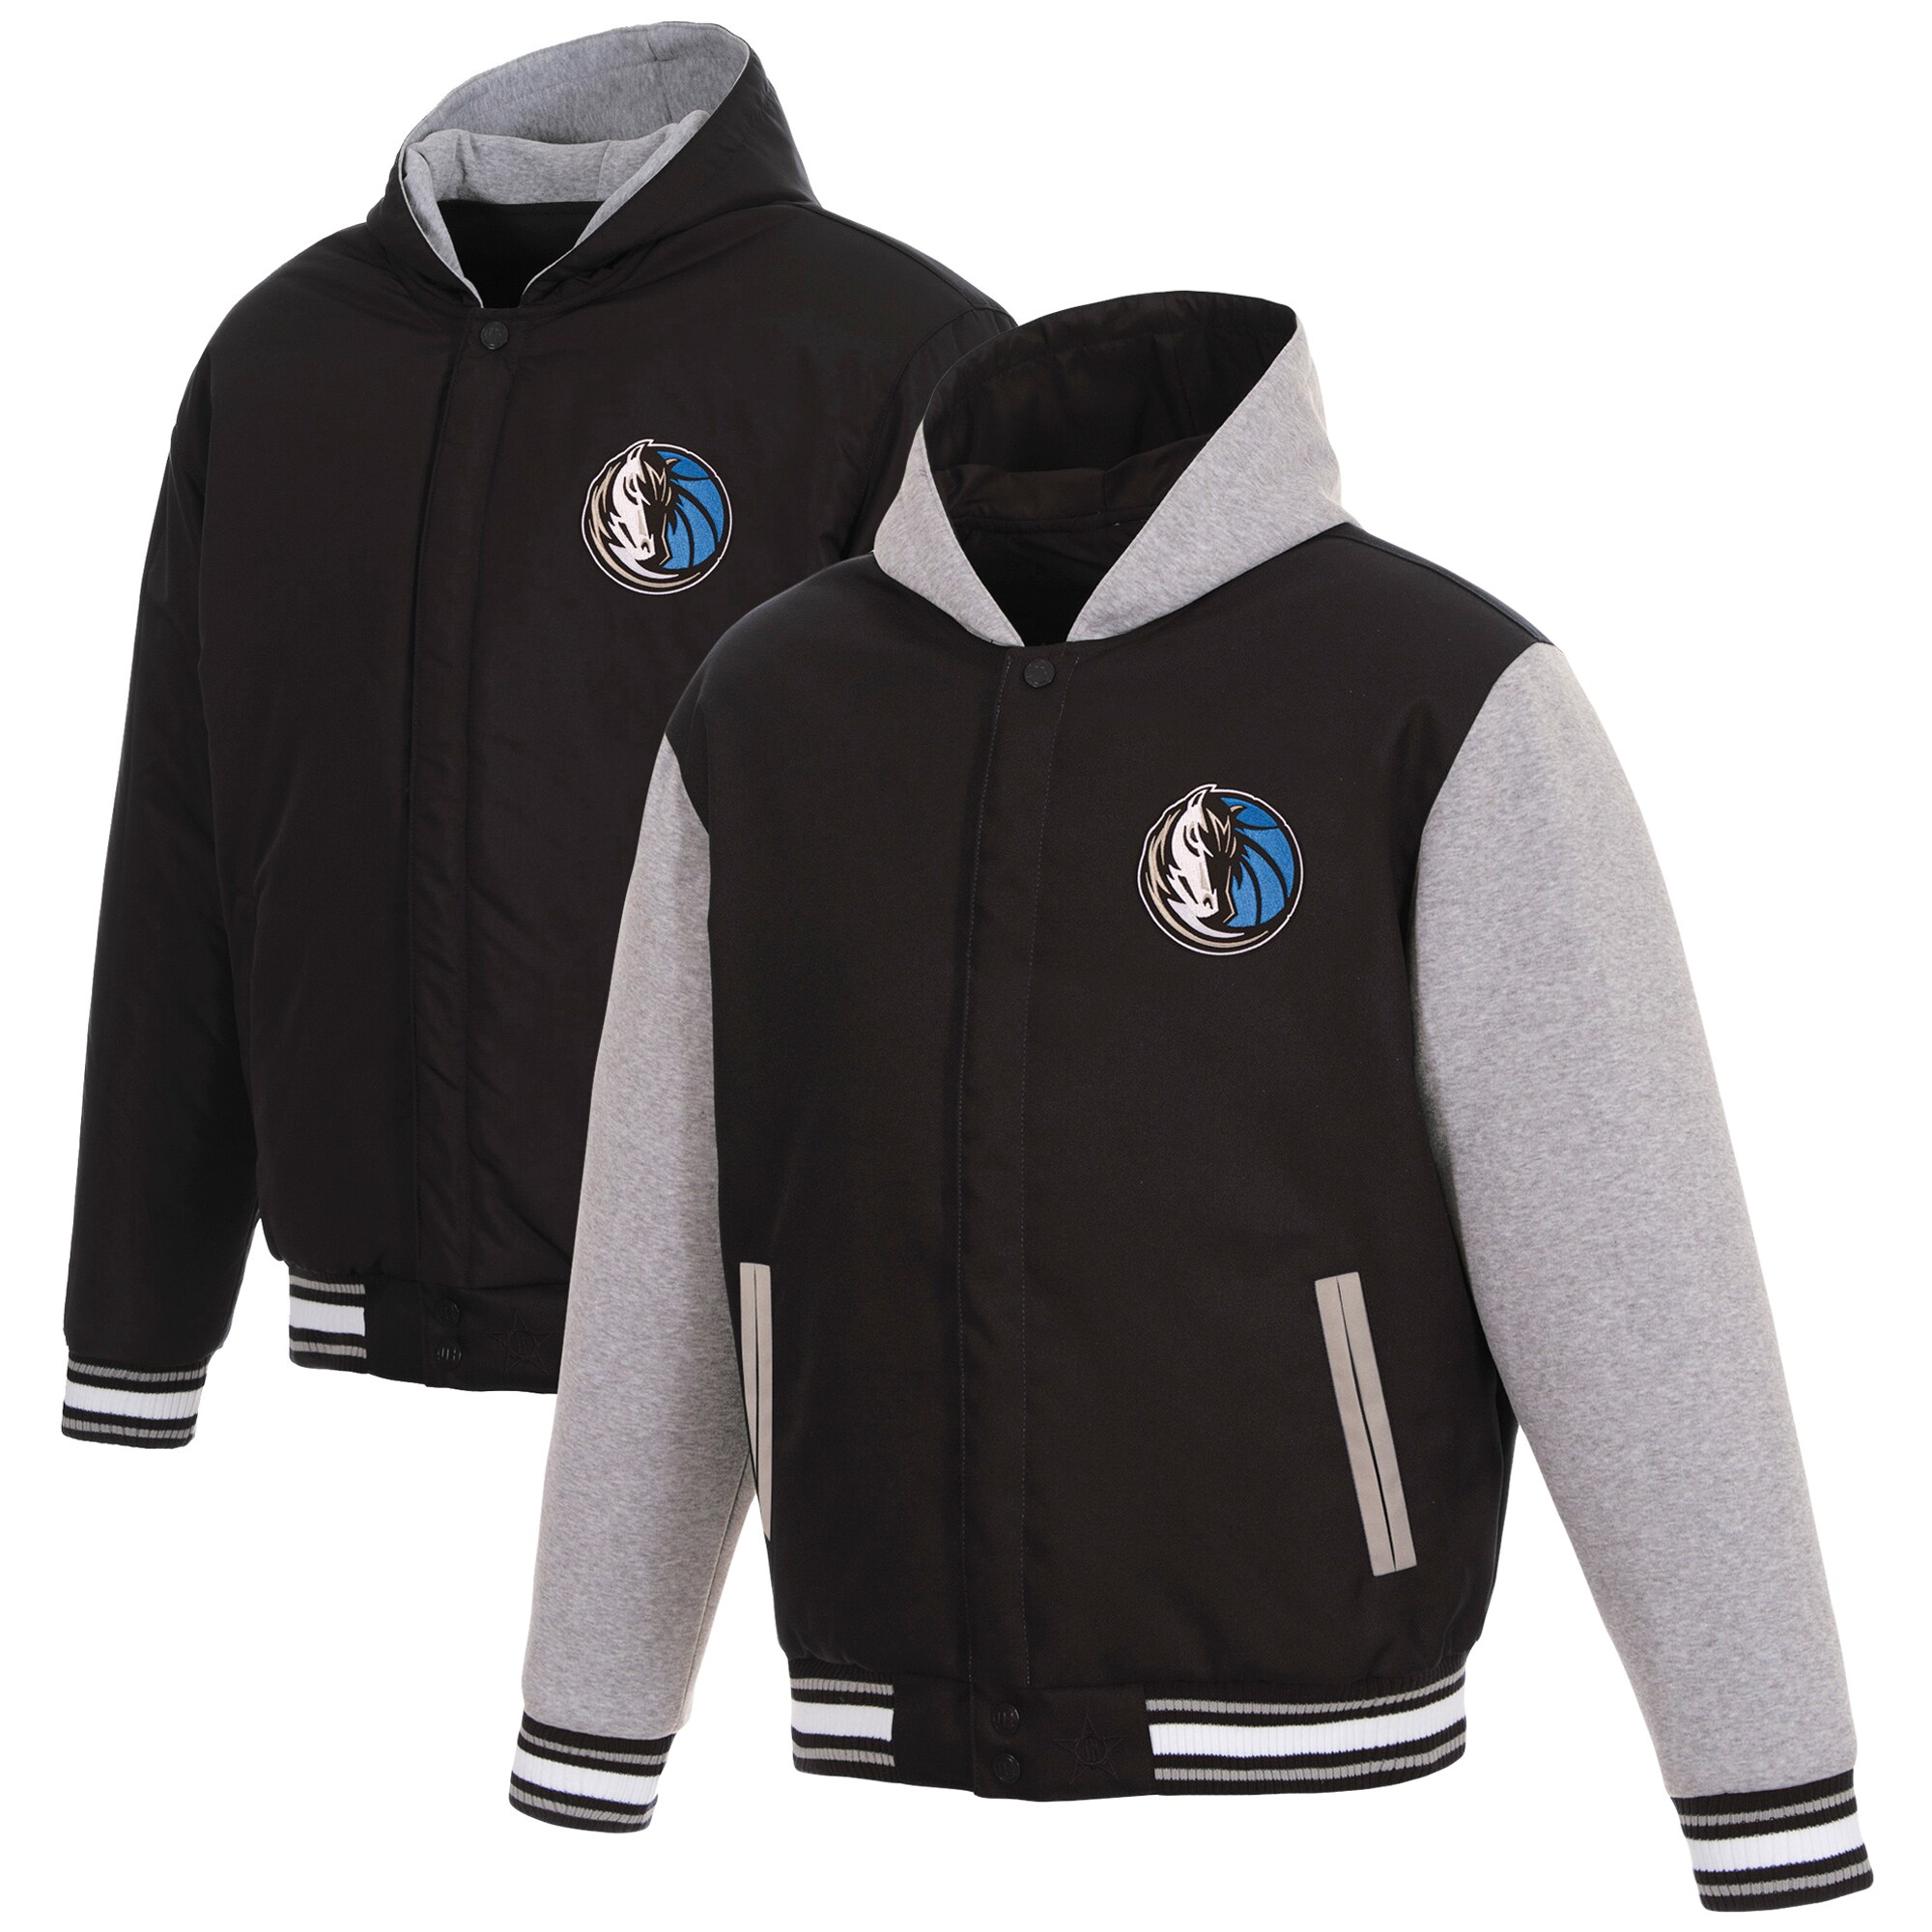 Dallas Mavericks JH Design Reversible Poly-Twill Hooded Jacket with Fleece Sleeves - Black/Gray